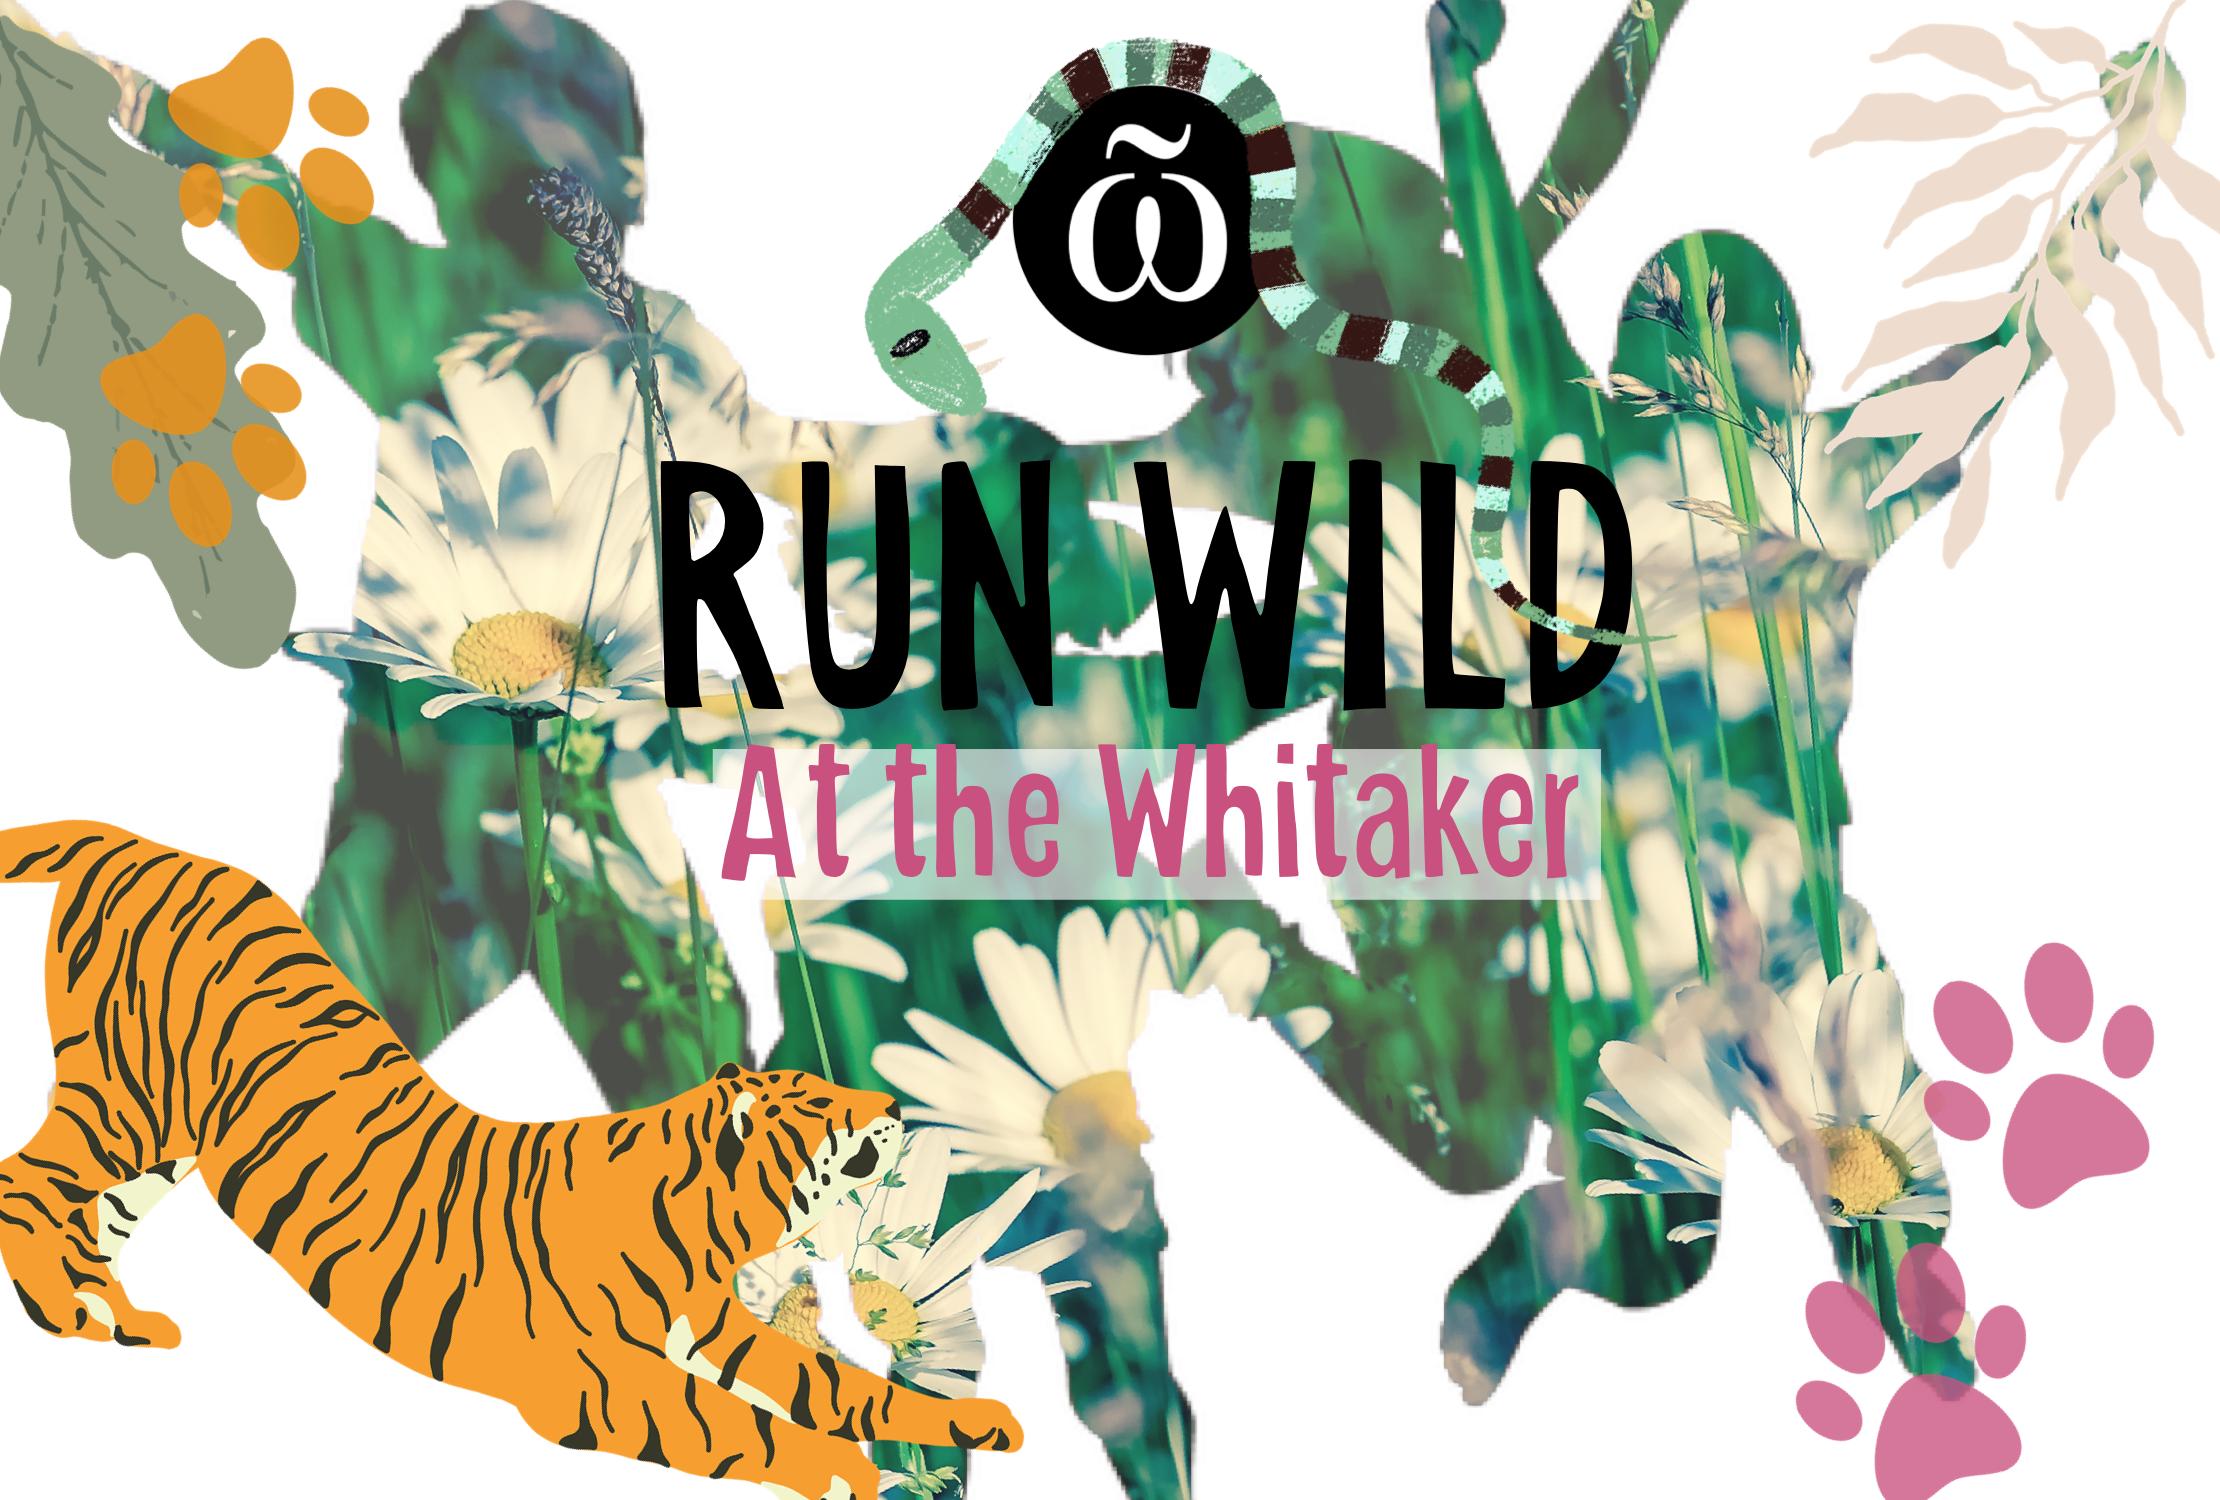 Run wild at the Whitaker